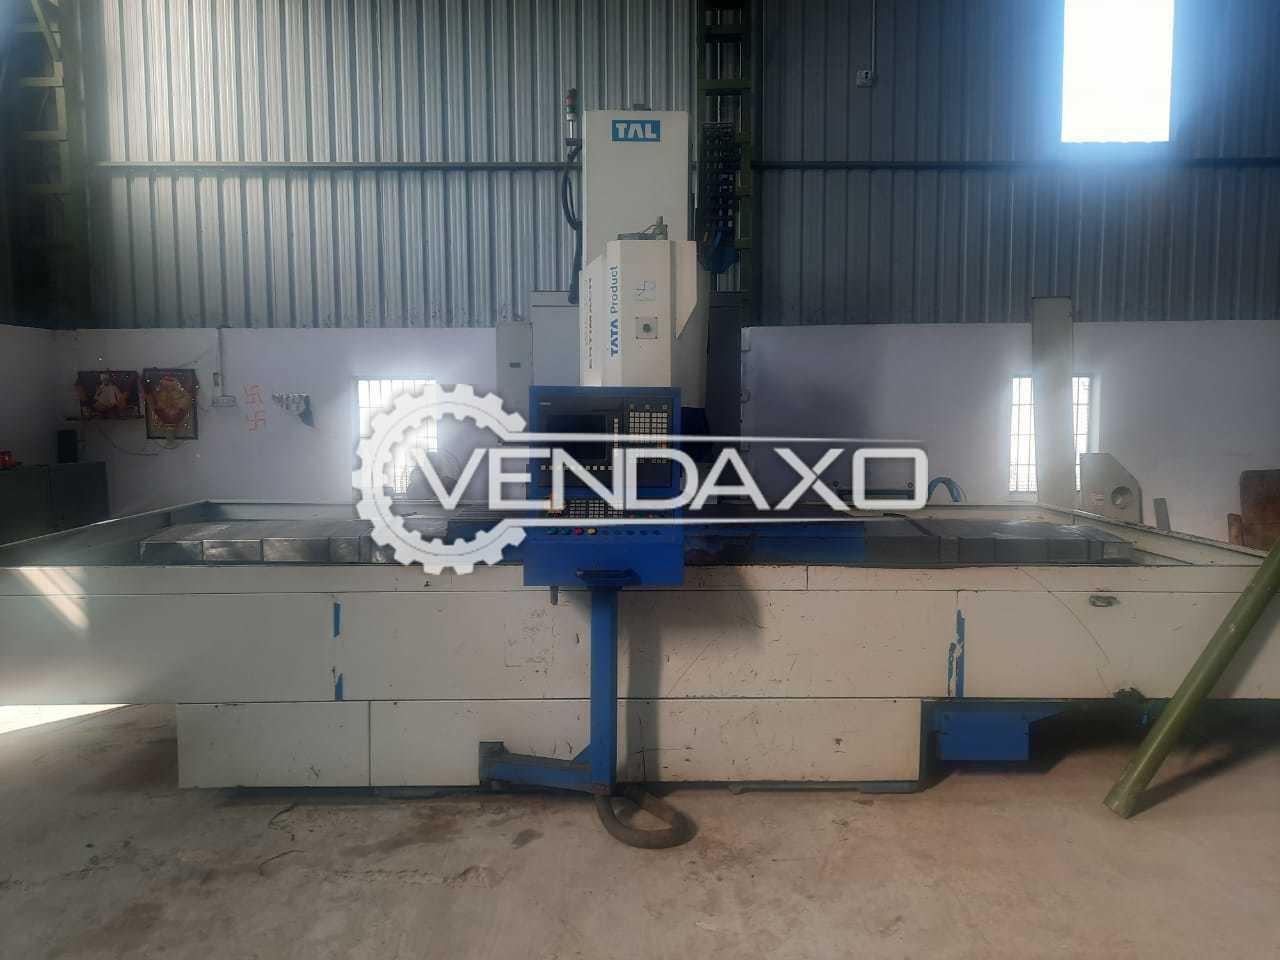 TAL Vermitech V-900 CNC Vertical Machining Center VMC - 2000 x 900 x 800 mm